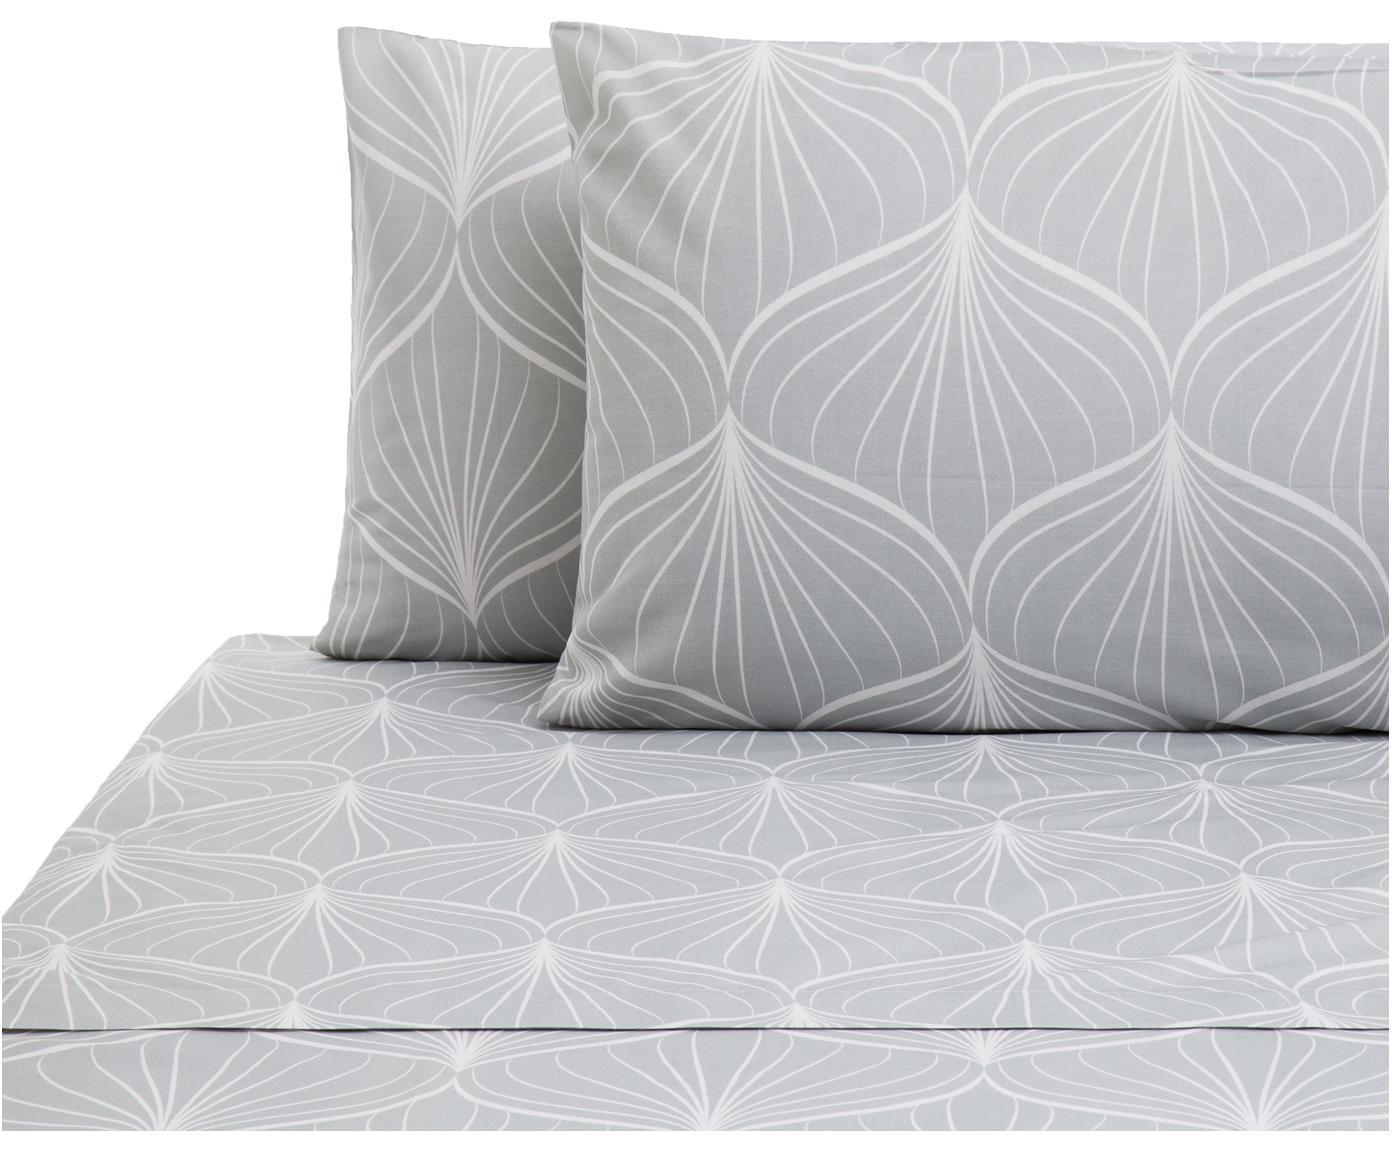 Set lenzuola in cotone Rama 2 pz, Cotone, Grigio, bianco, 160 x 200 cm